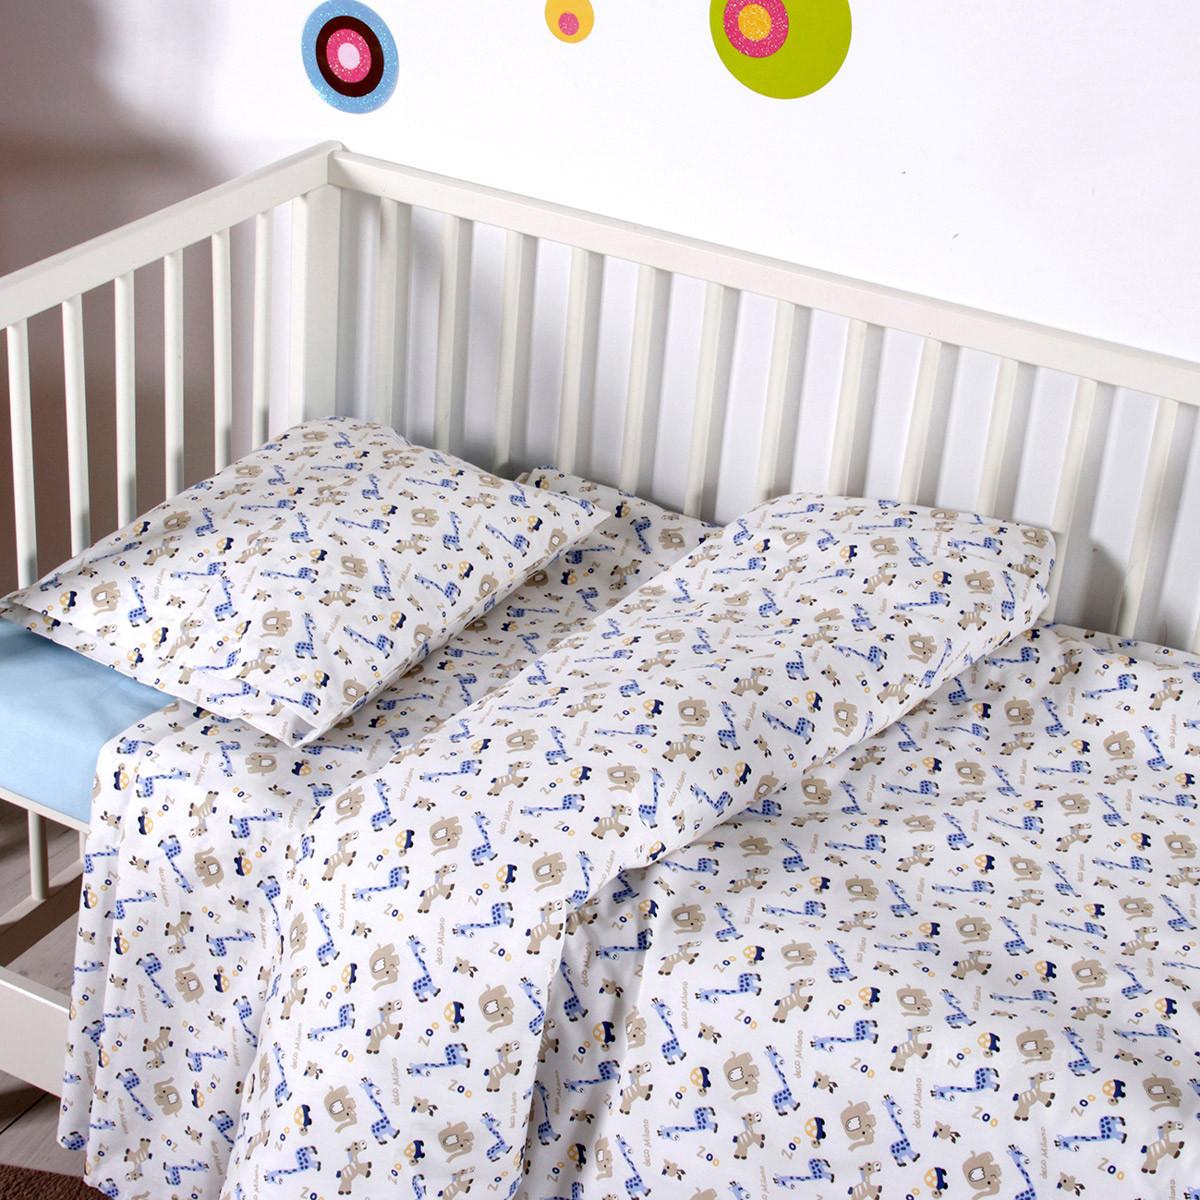 8f4990b9877 Βρεφικά > Σεντόνια Βρεφικά Sb Home - Oikiamag.gr - Διακόσμηση ...